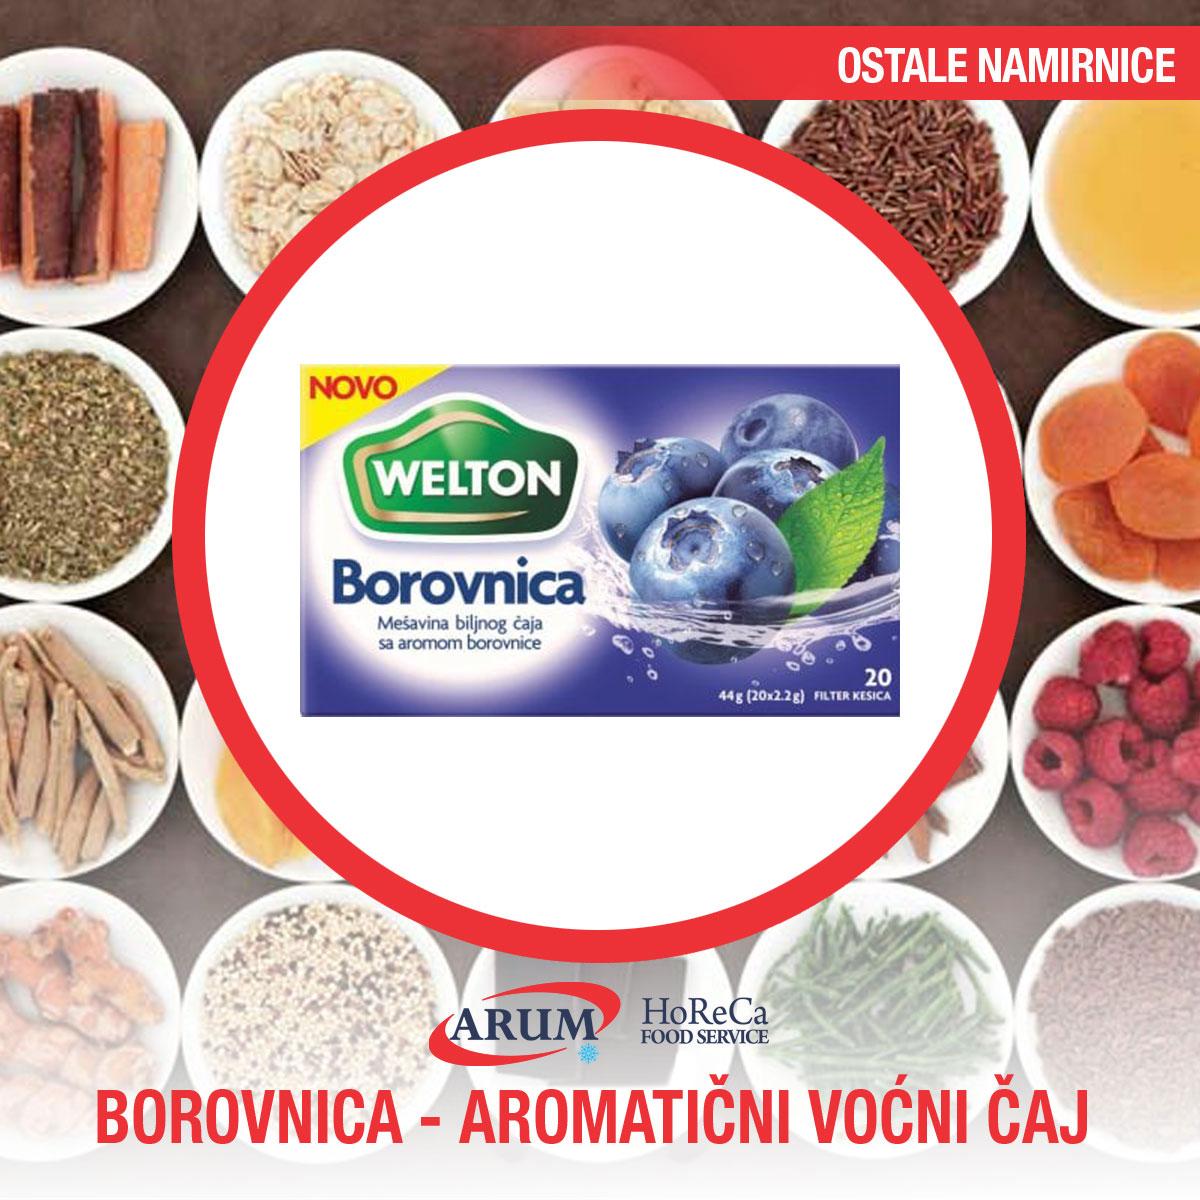 Borovnica-aromaticni vocni caj 44g (12/1#)